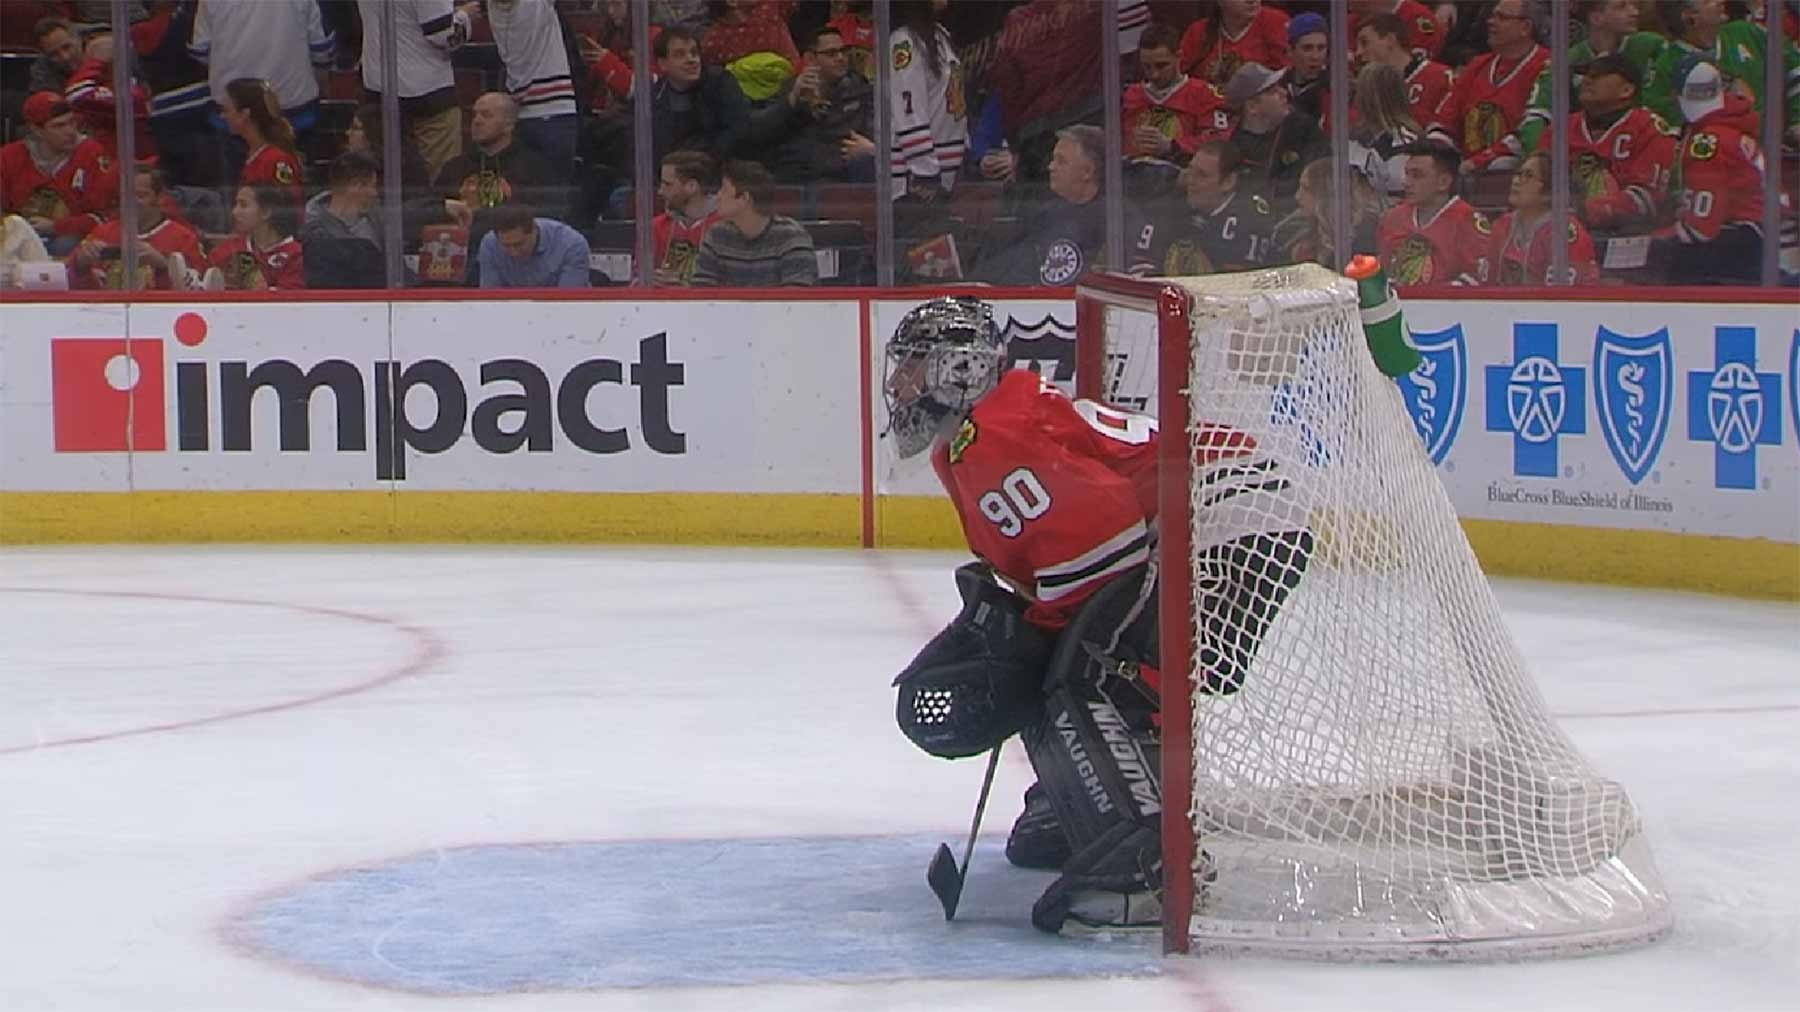 36-jähriger Notfalltorwart spielt sensationelle NHL-Partie scott-foster-notfalltorwart